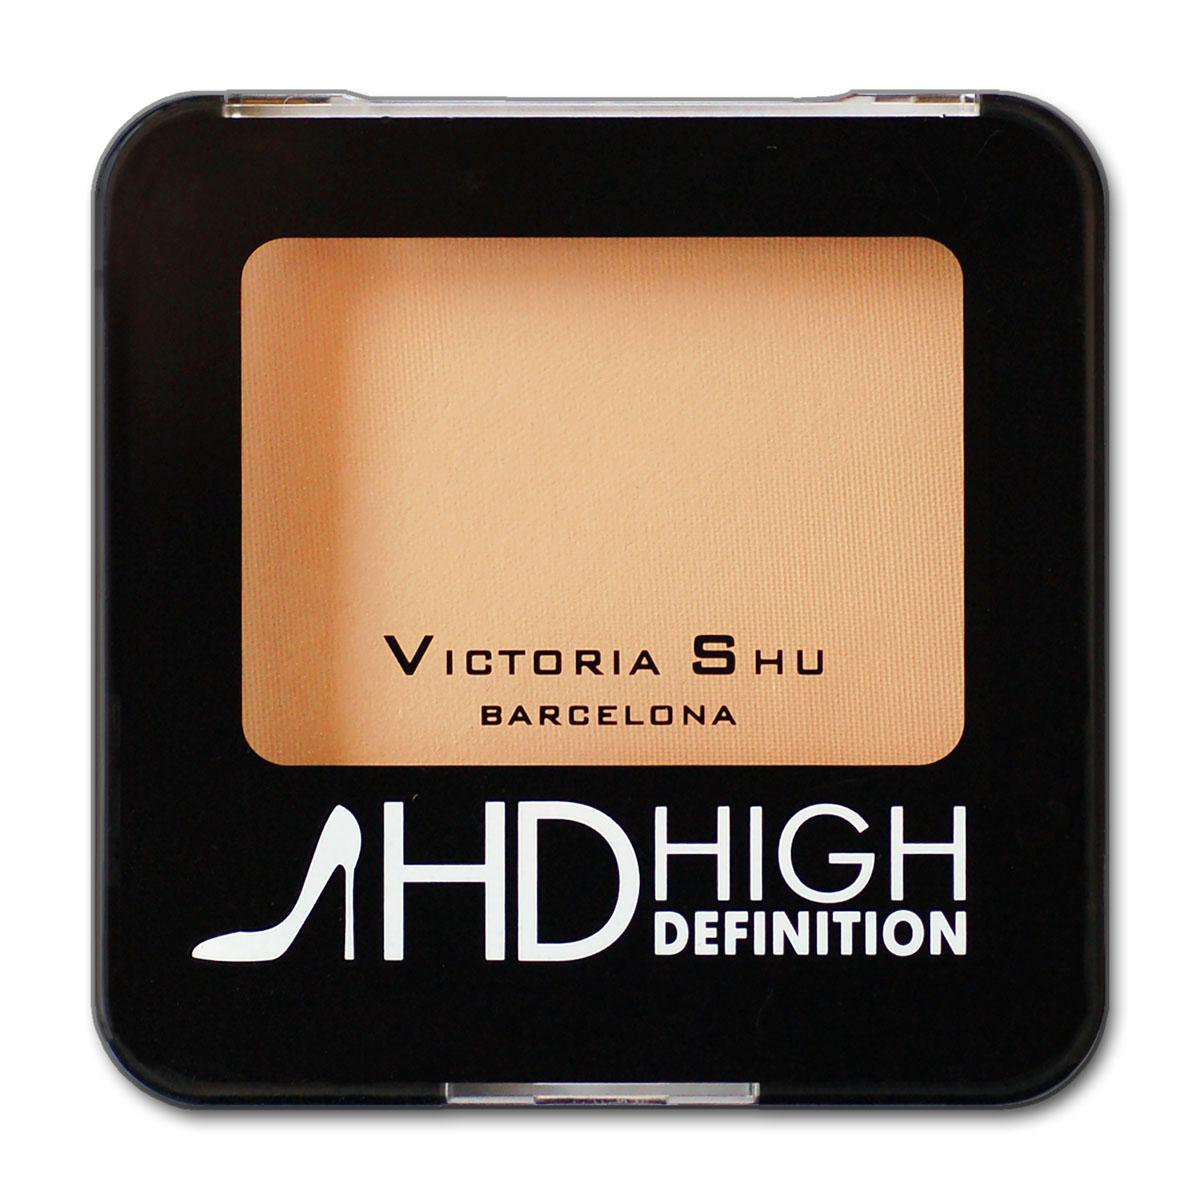 Victoria Shu Пудра компактная High Definition №313